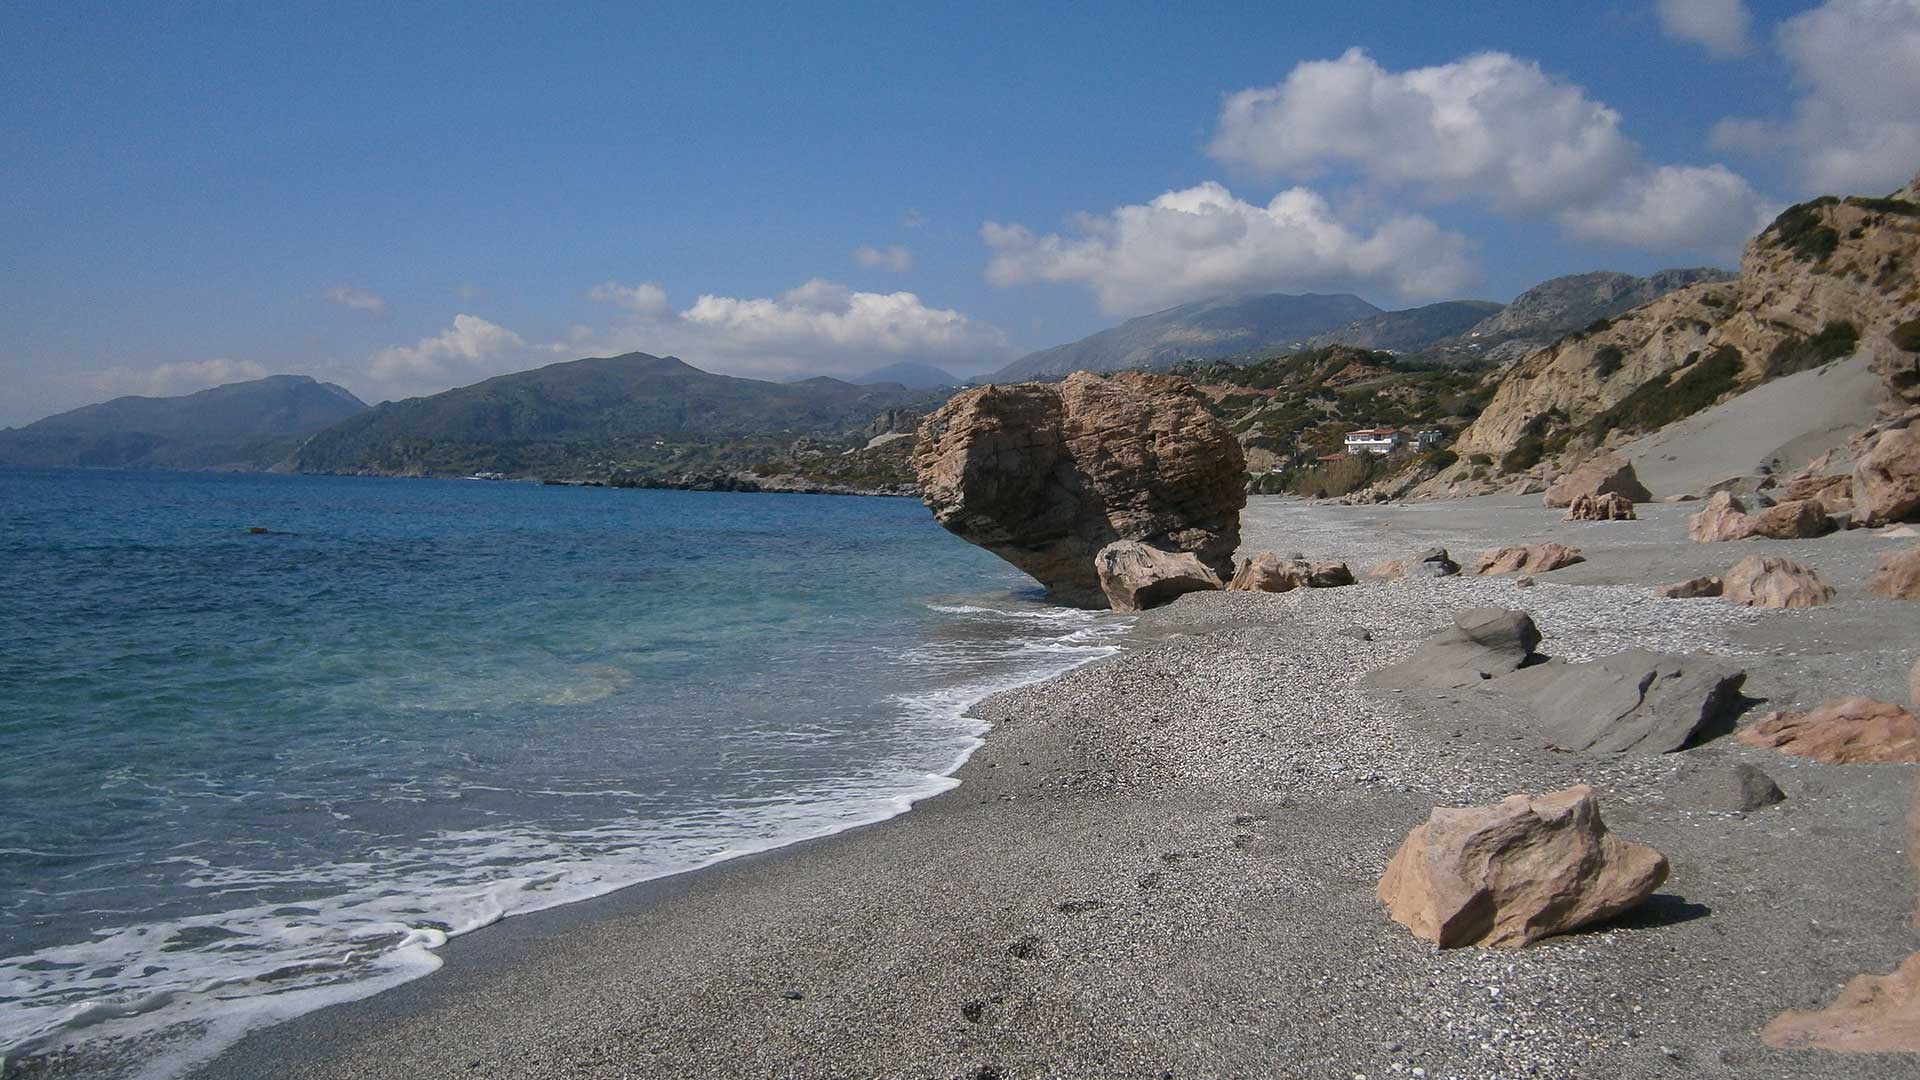 South seaside of Rethymno